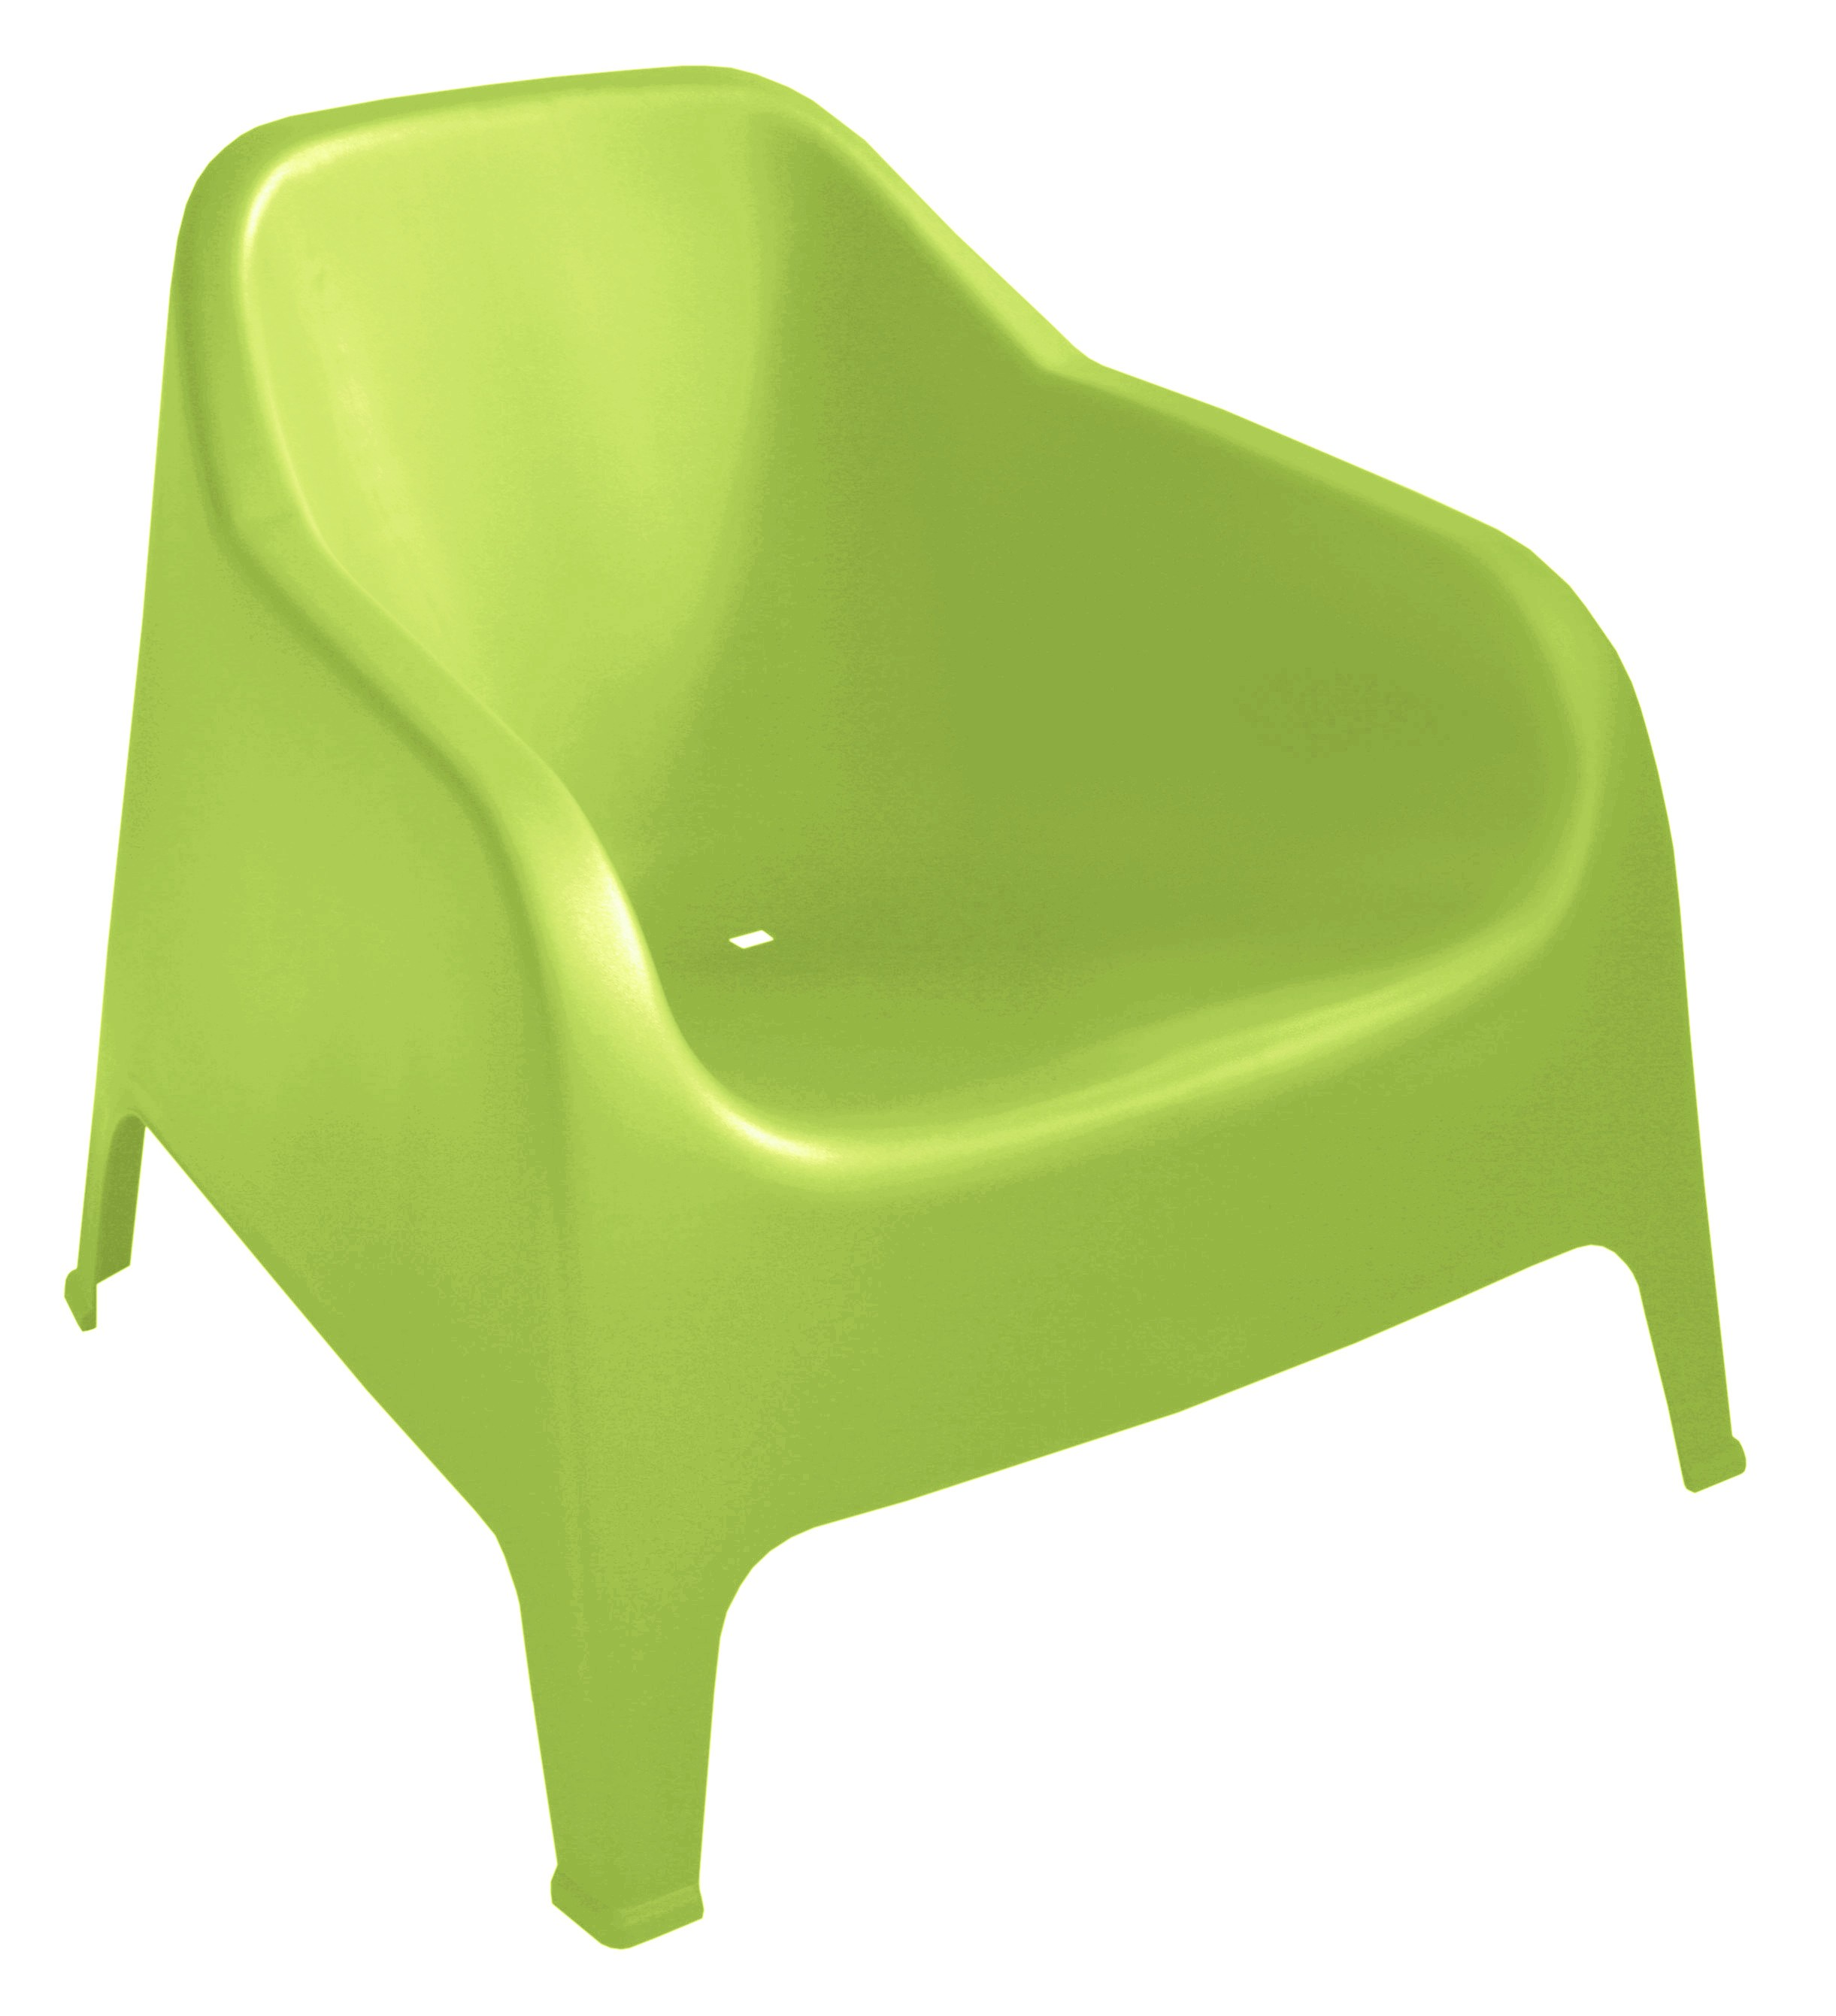 Armchair SUNNY BIG, Stackable, Polypropylene Lime Green